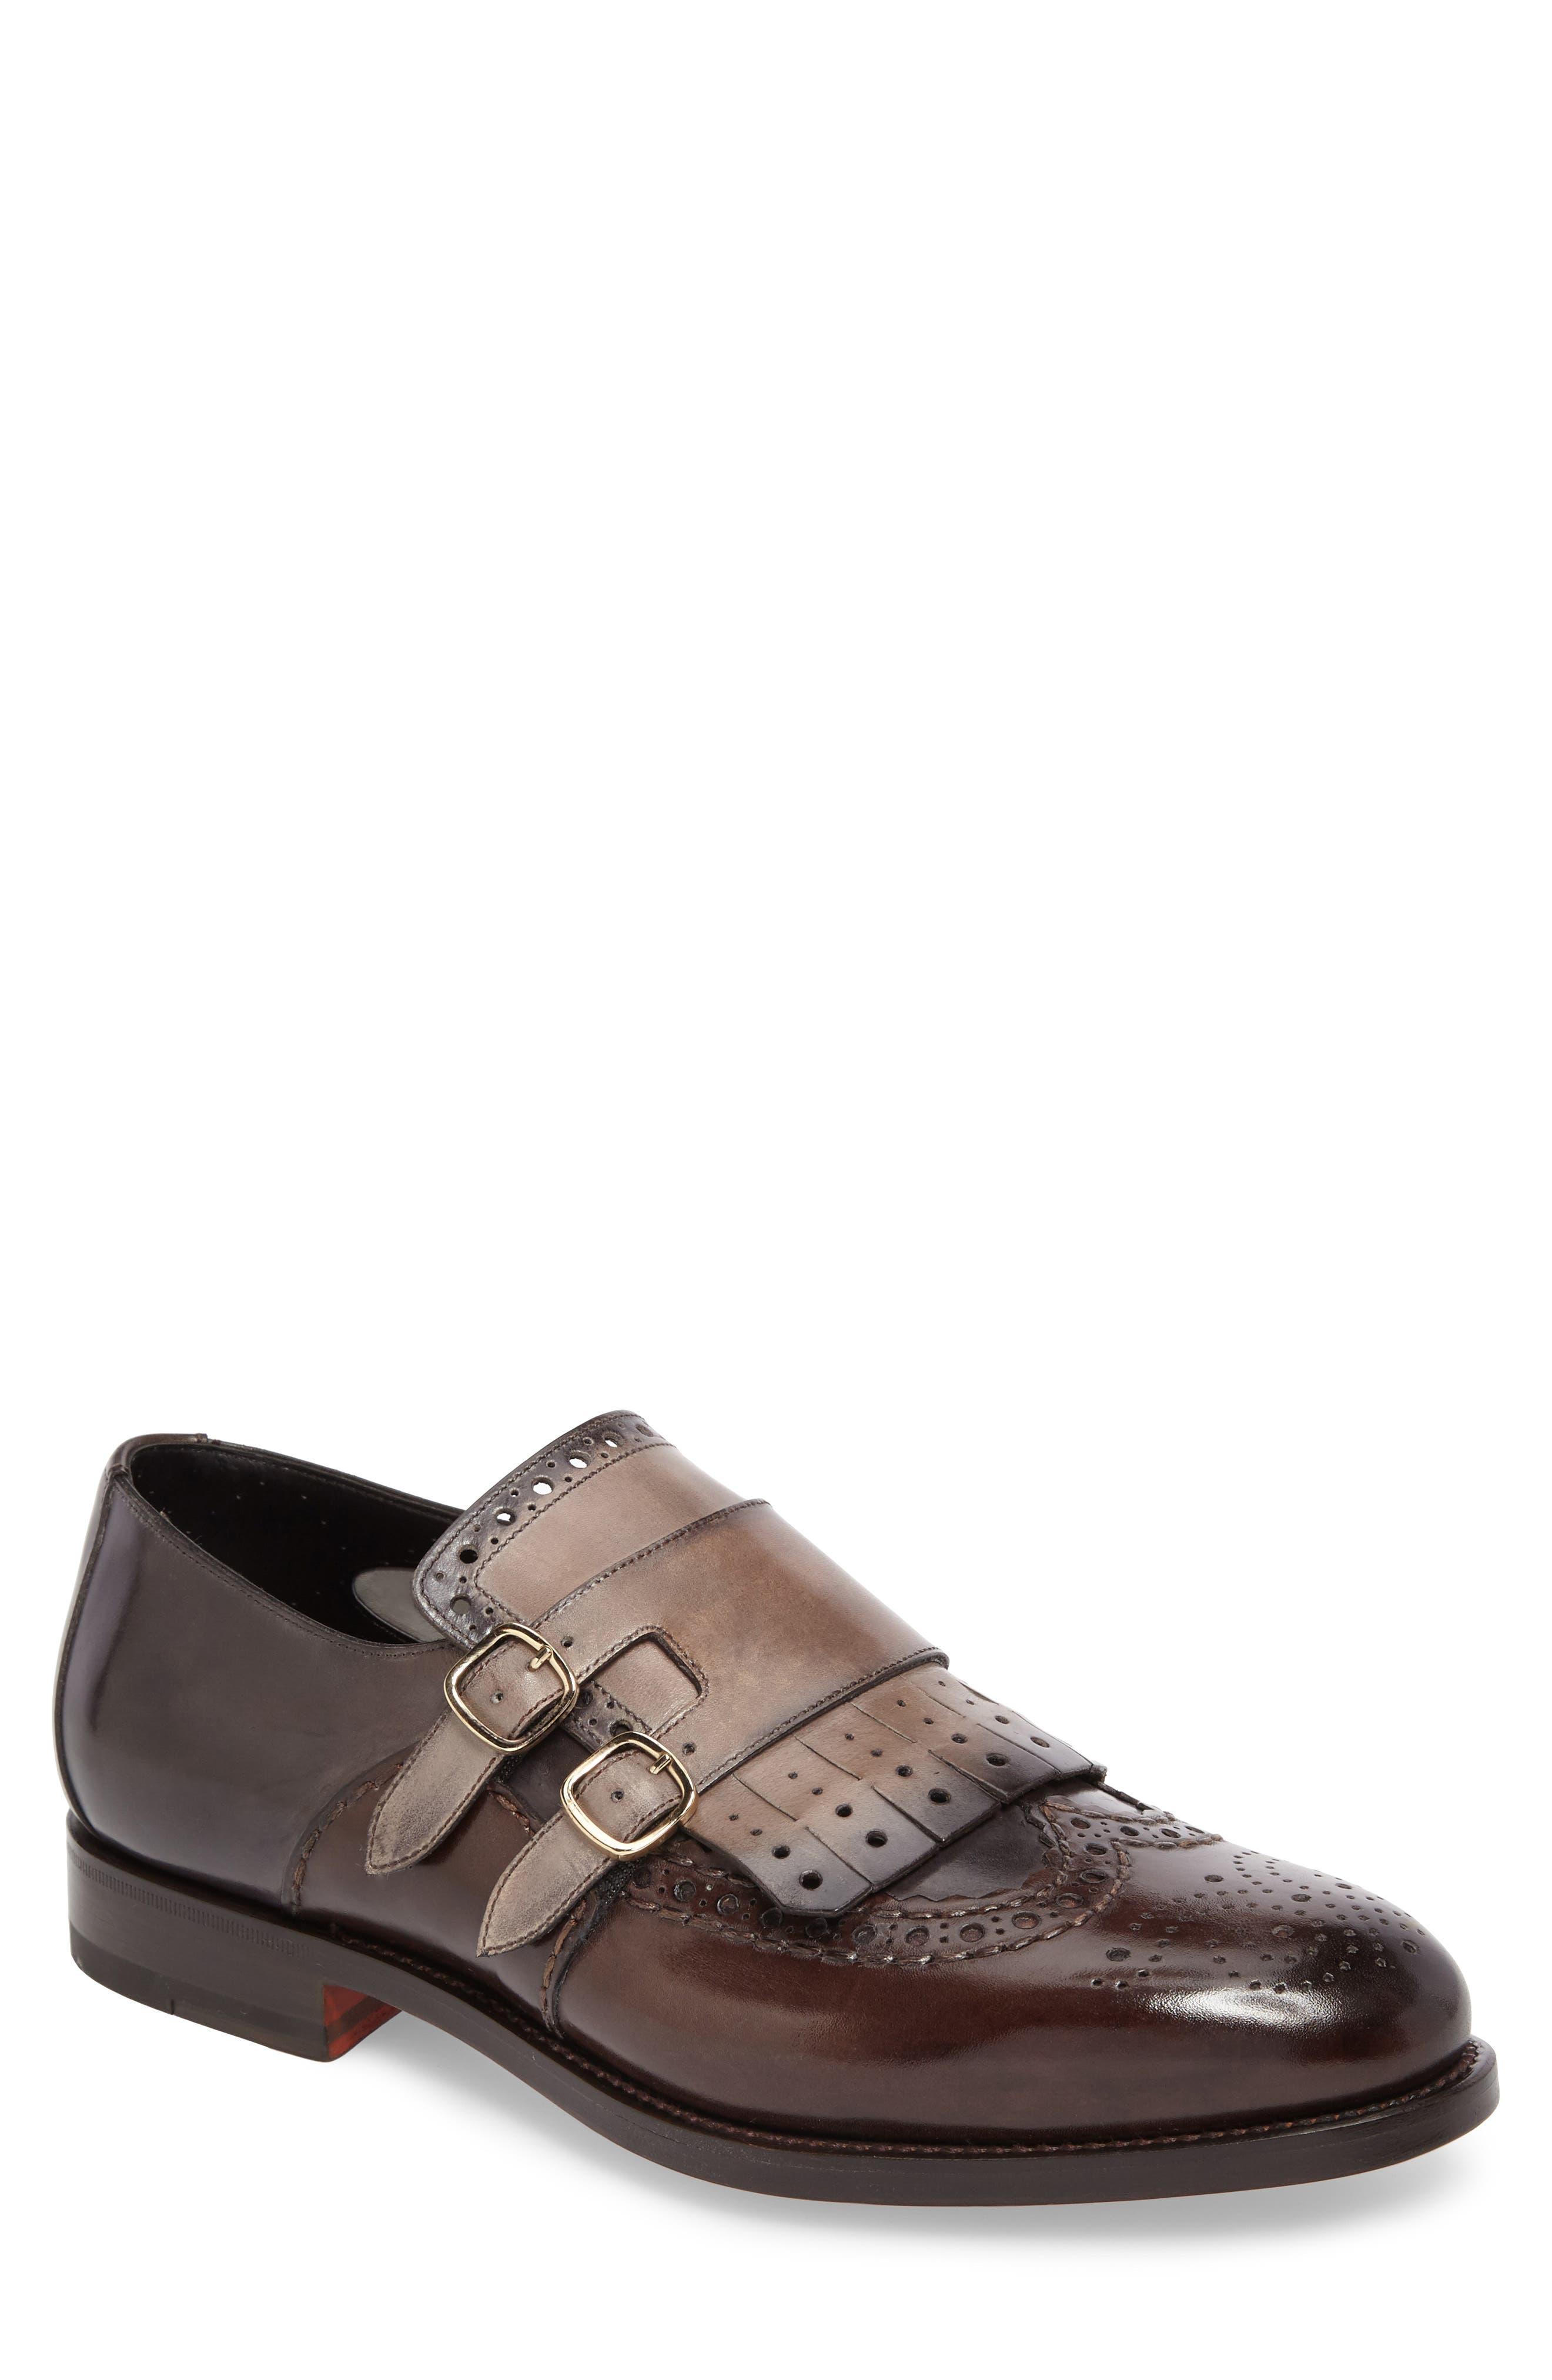 Main Image - Santoni Goodwin Double Monk Strap Shoe (Men)